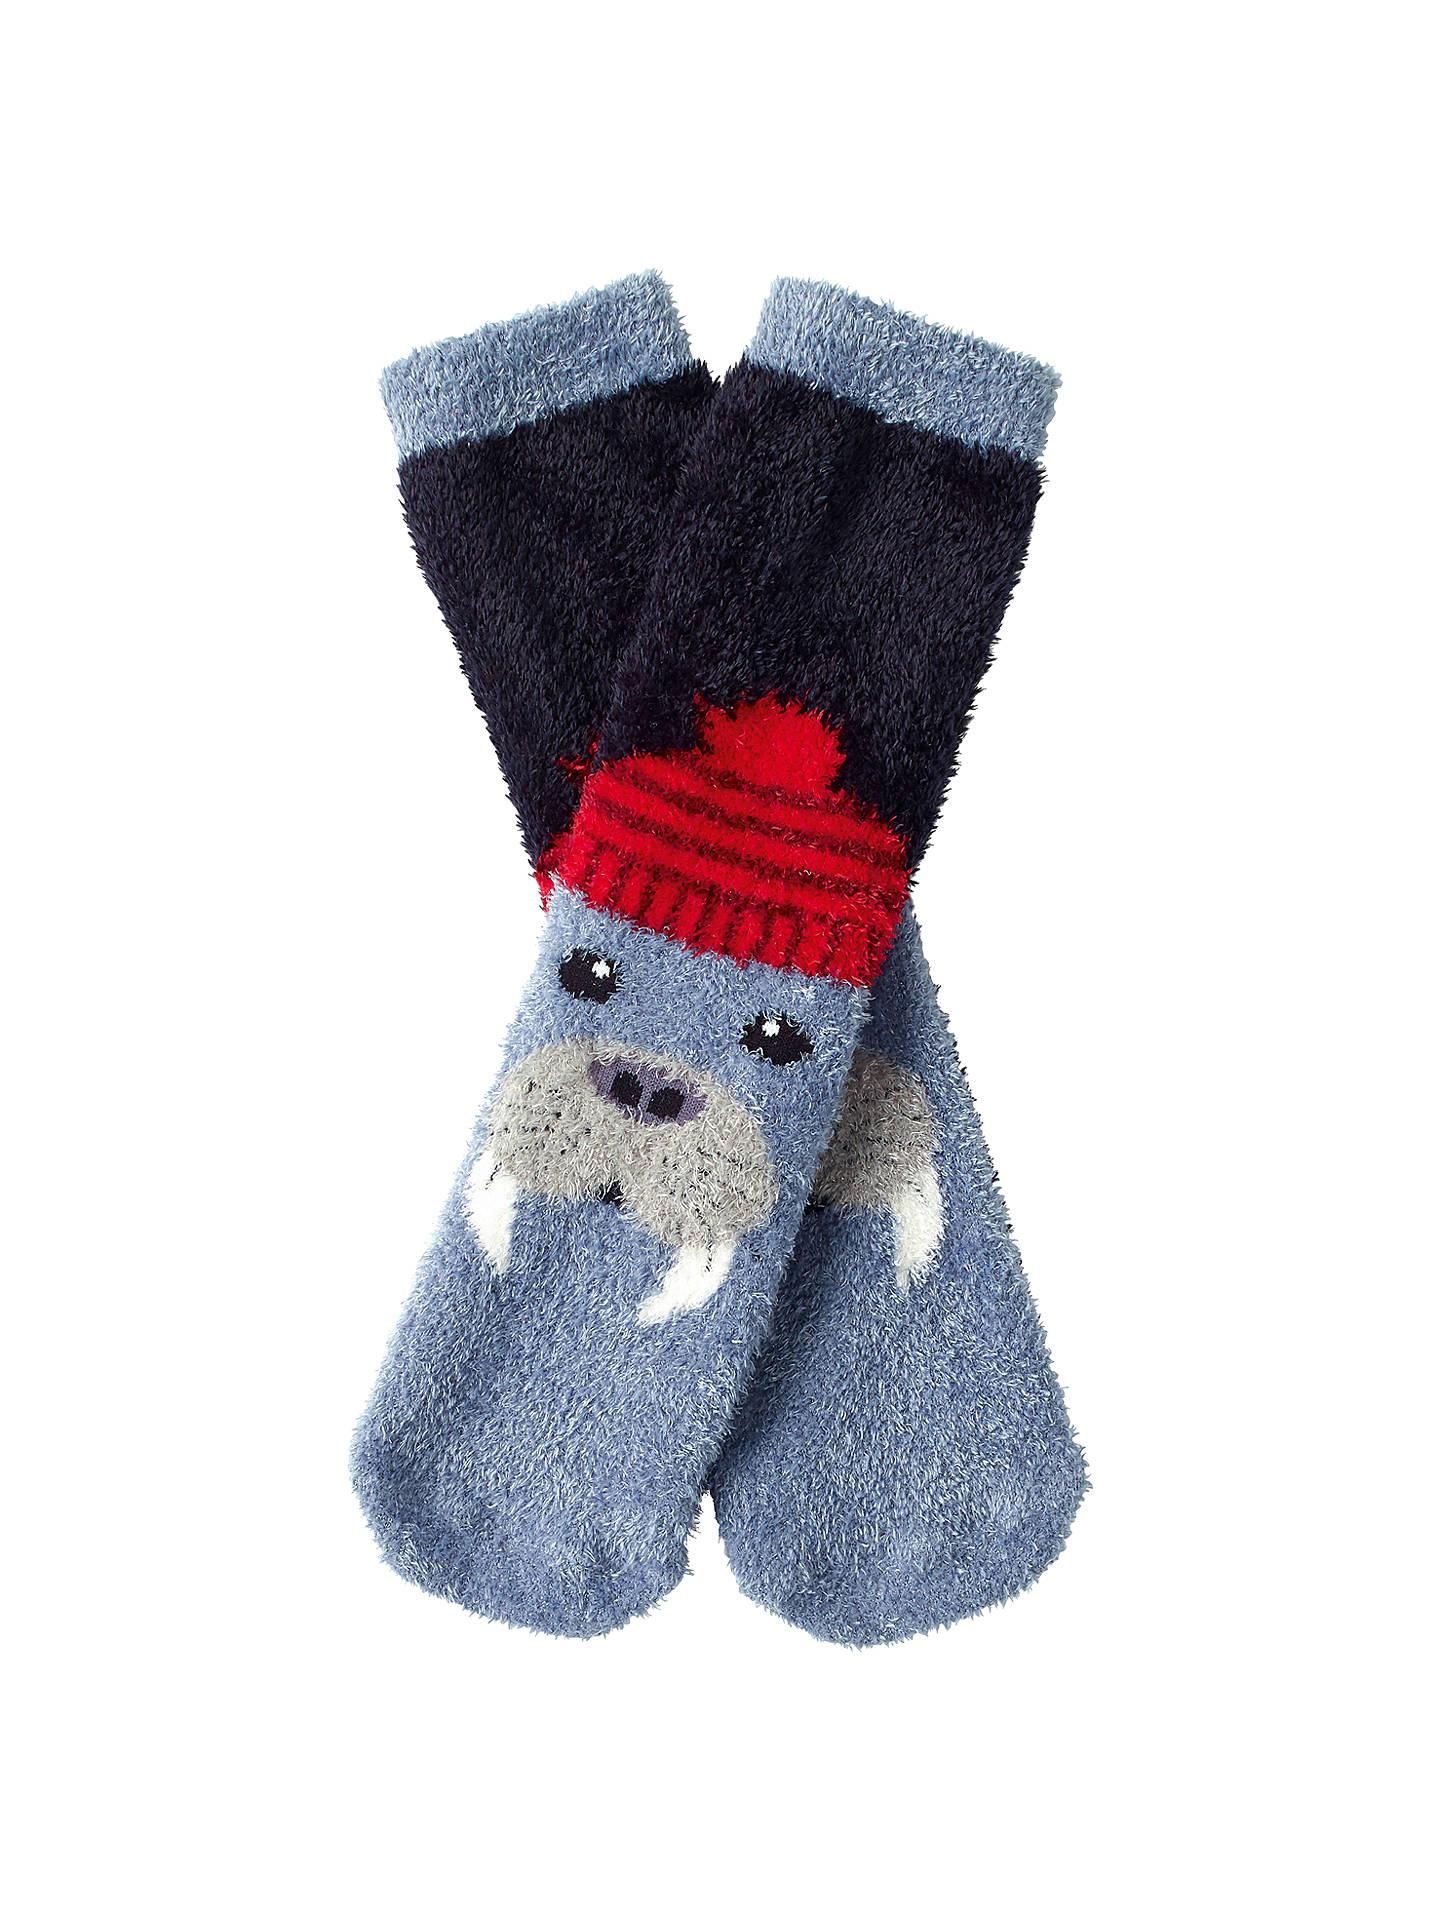 Fat Face Childrens Fluffy Walrus Socks Blue At John Lewis Partners